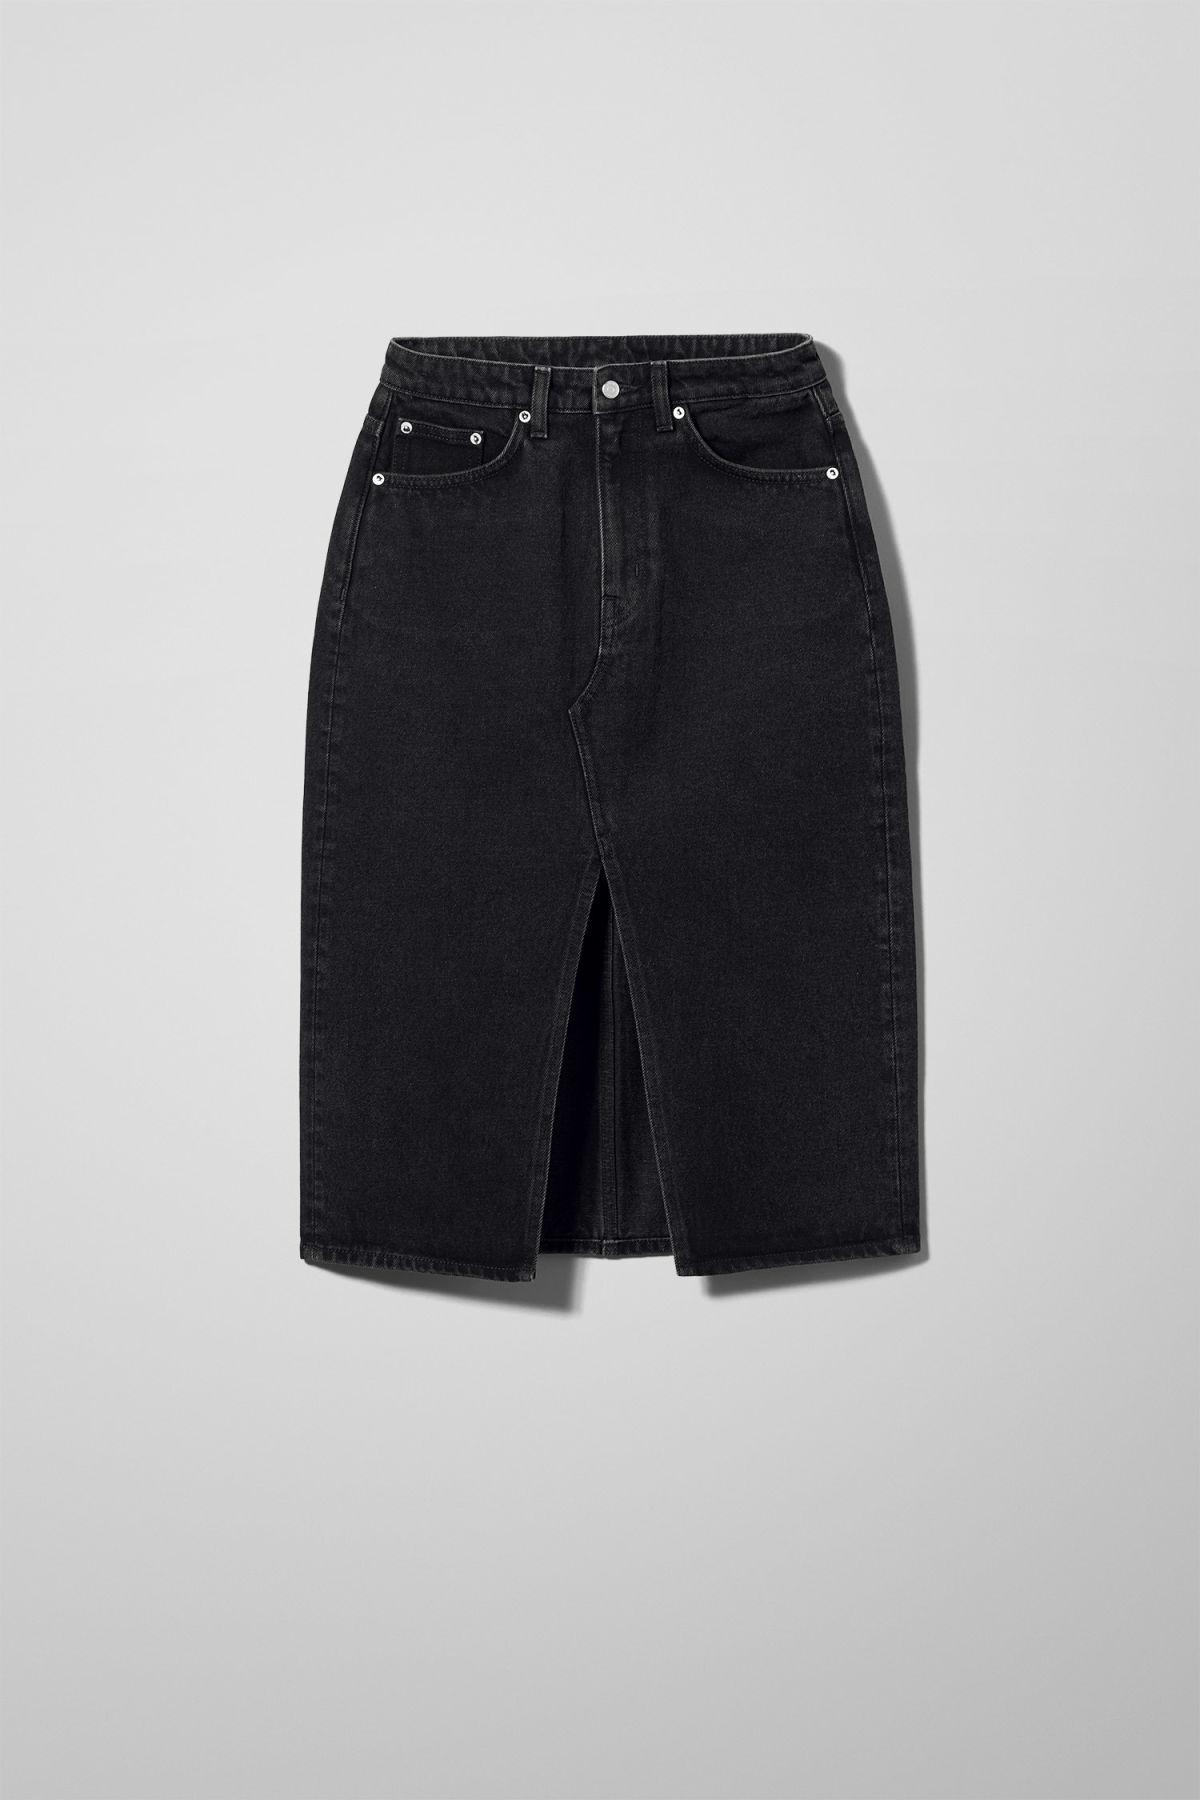 Wynn Tuned Black Denim Skirt - Black